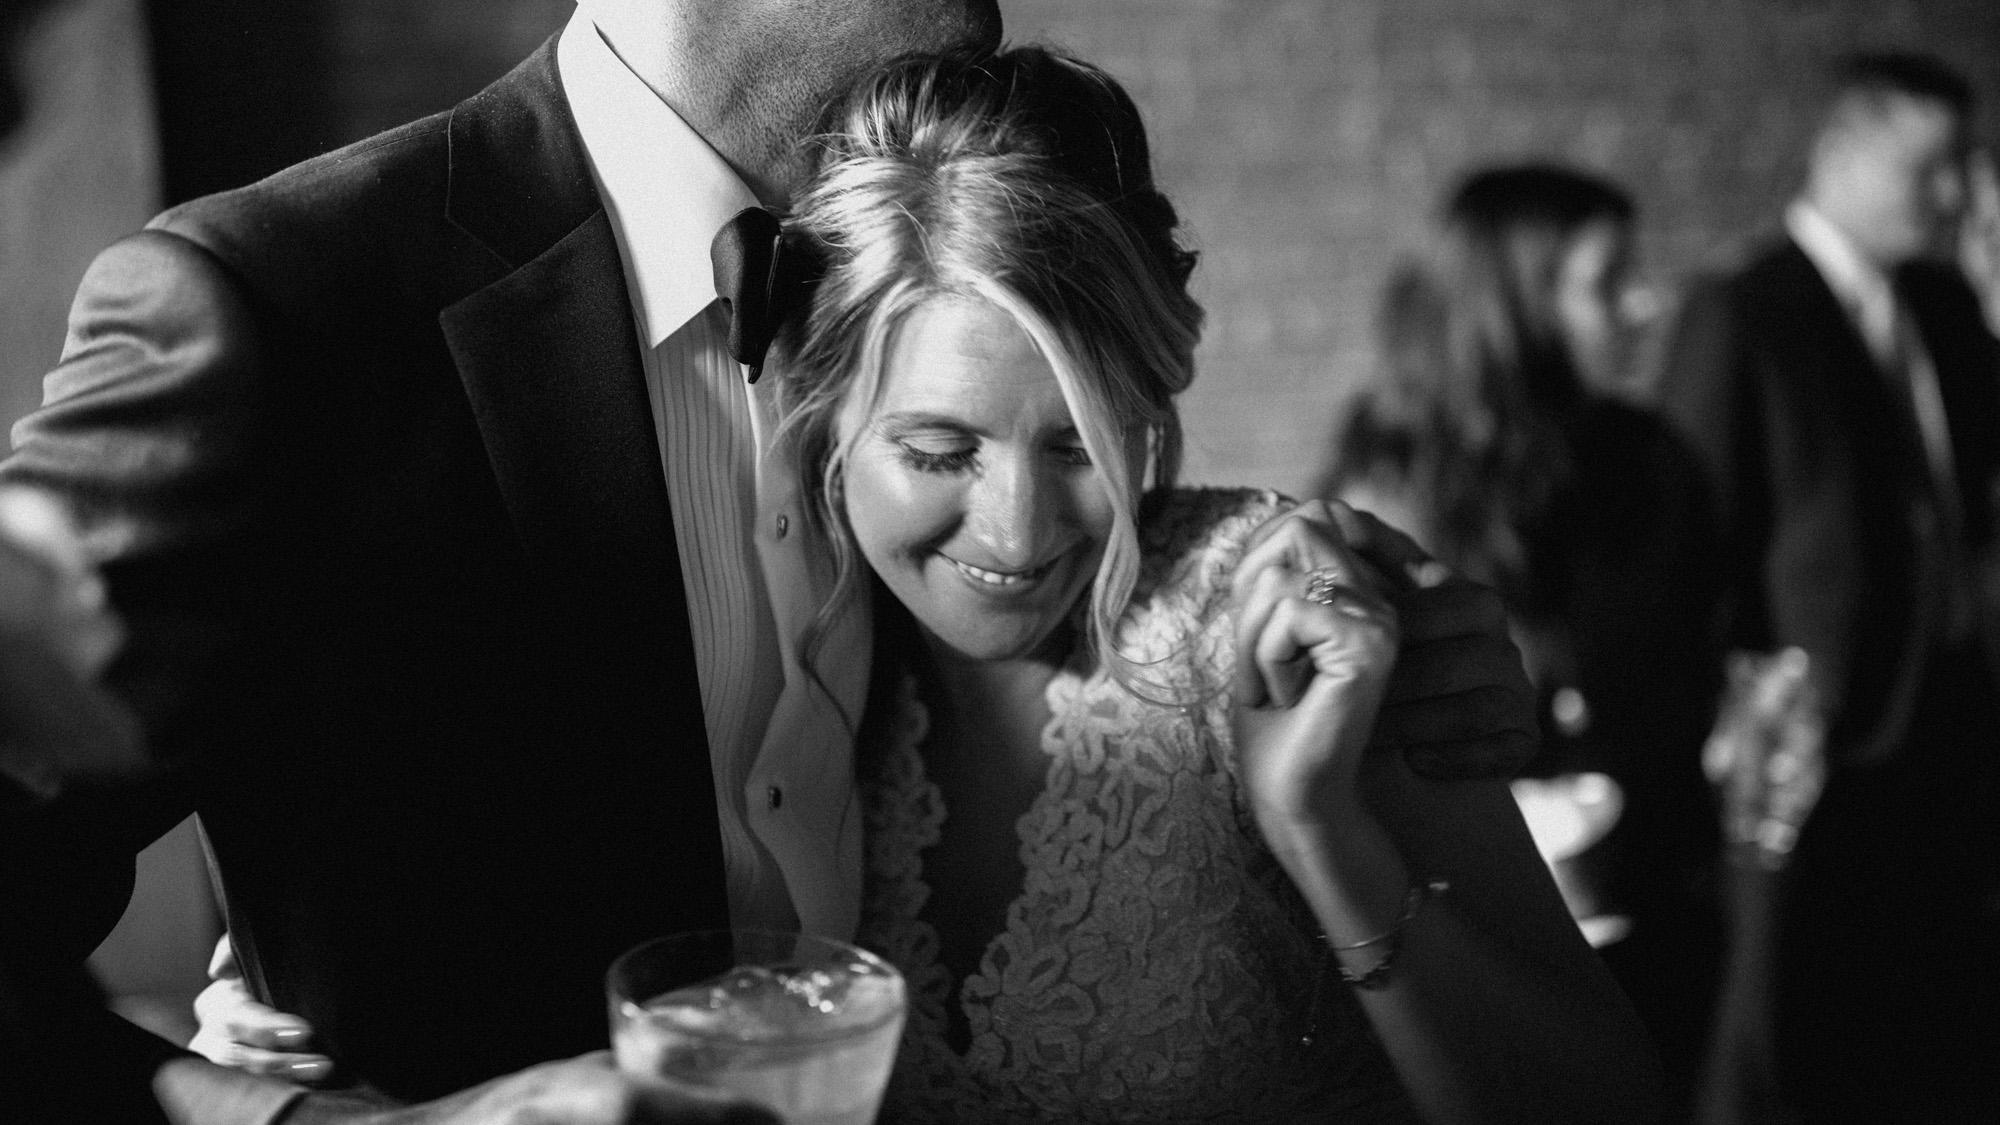 Alec_Vanderboom_kansas_city_hip_wedding_photos-0046.jpg